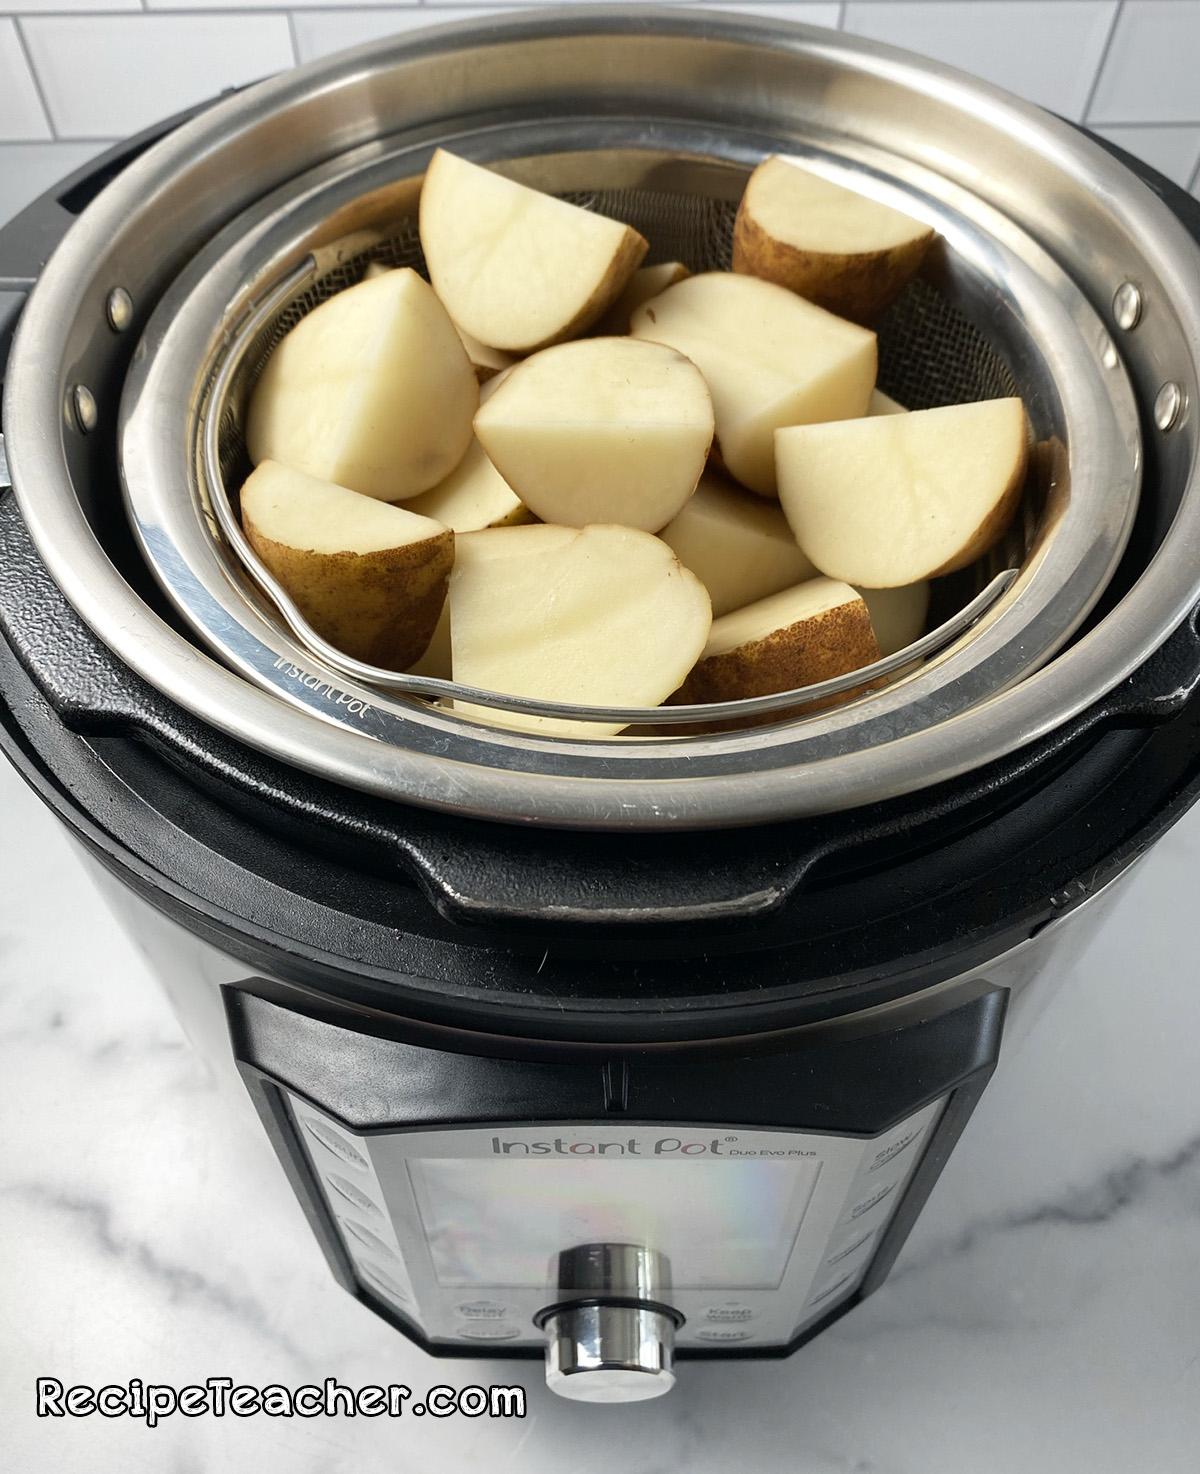 Recipe for Instant Pot parmesan garlic mashed potatoes